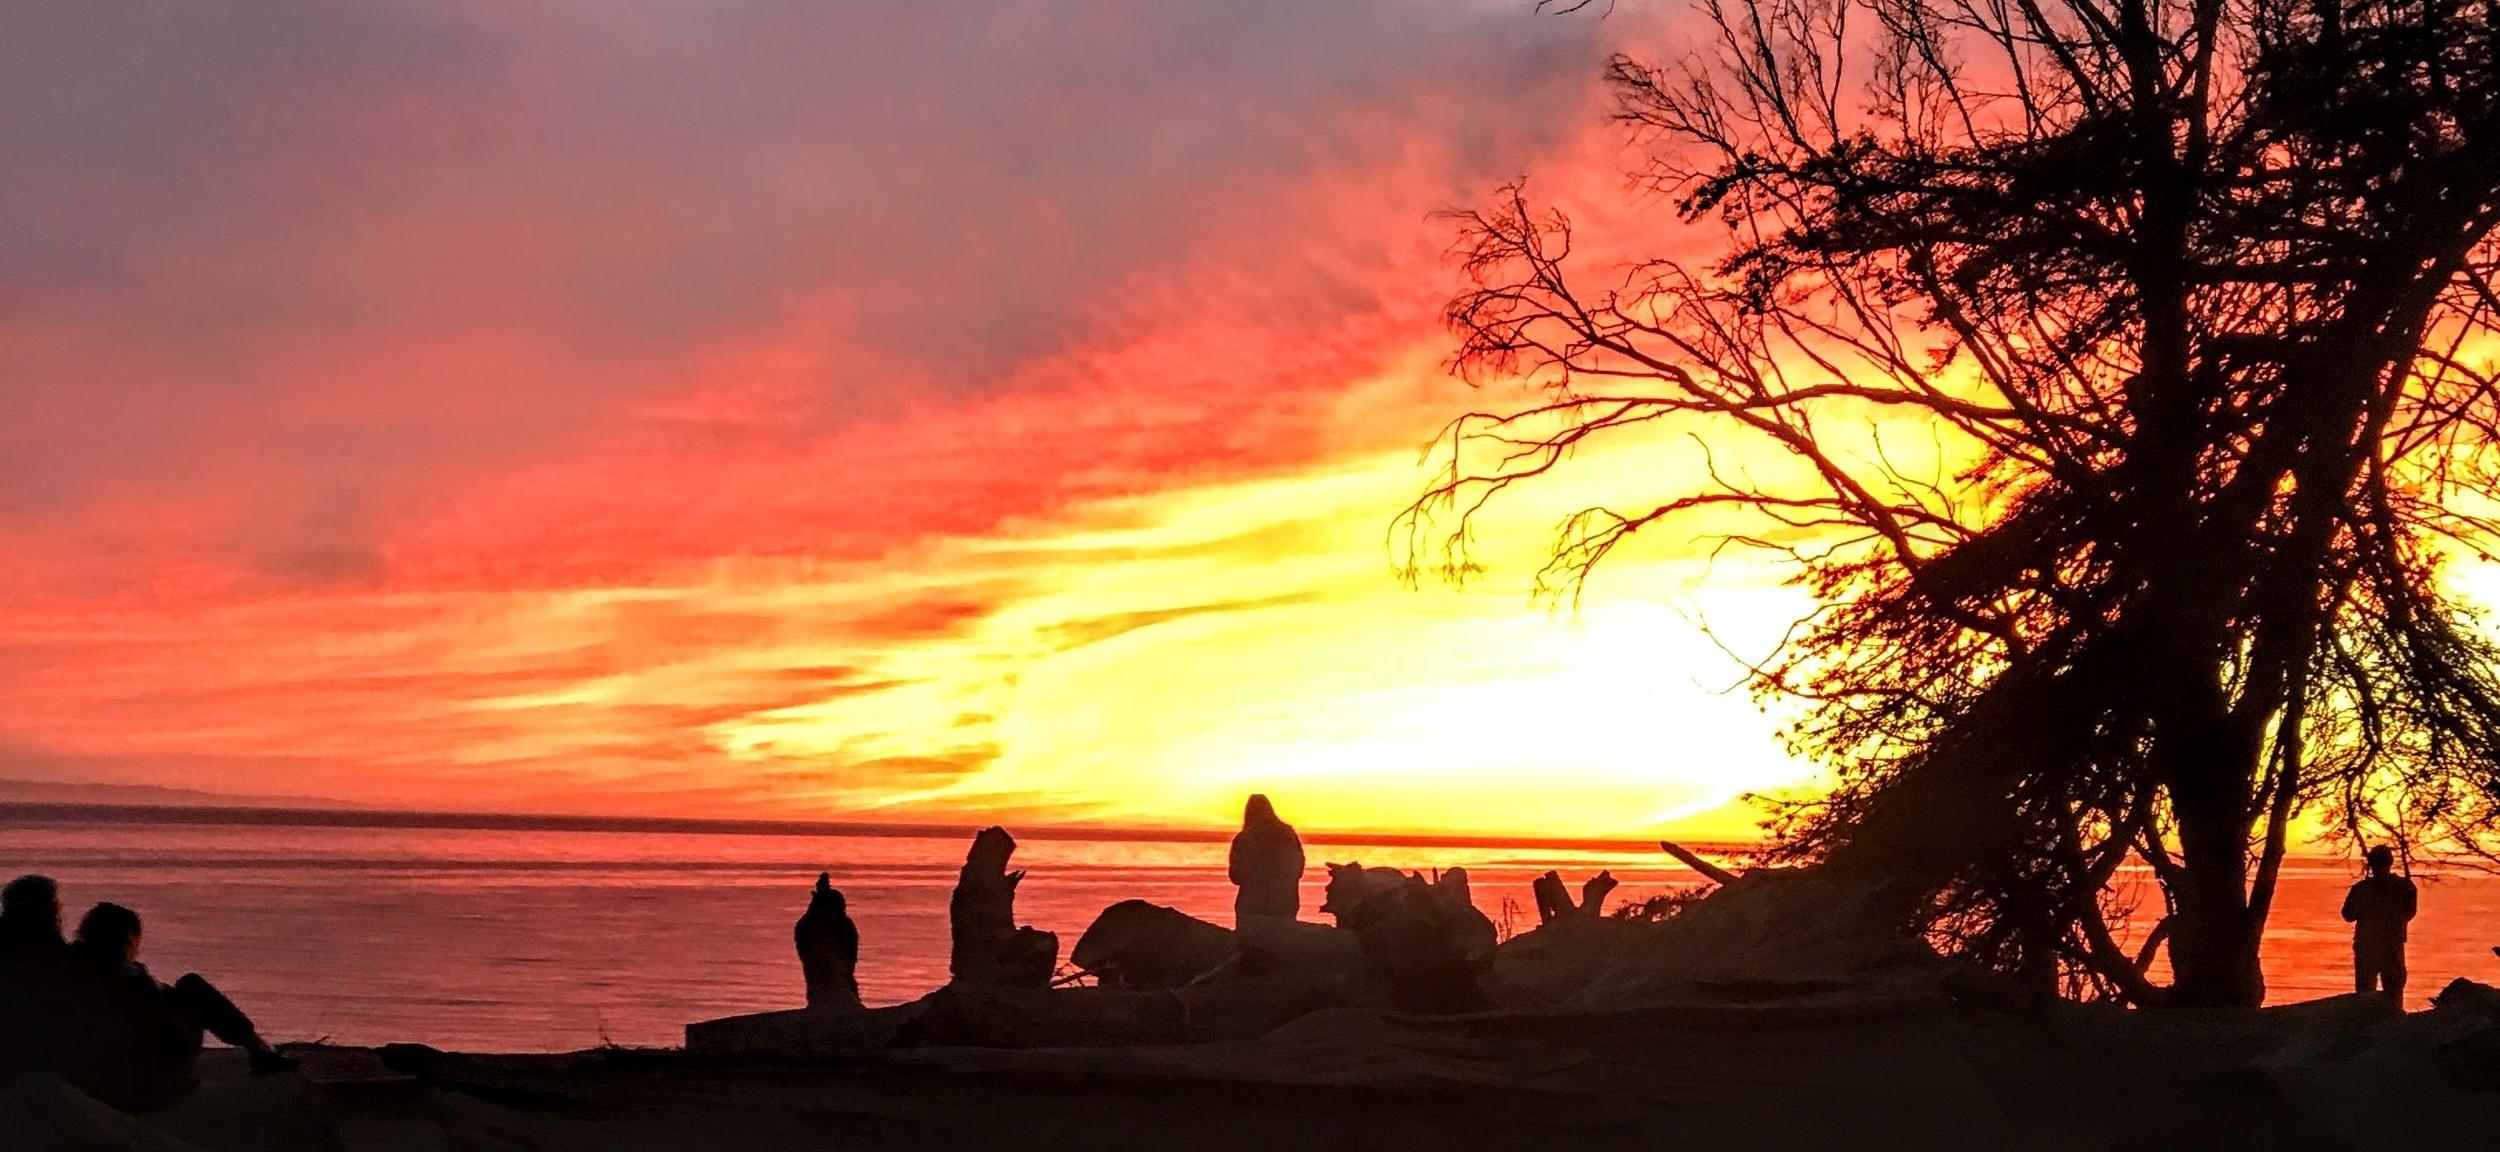 November sunset over the Pacific Ocean in Santa Barbara, CA (2017)